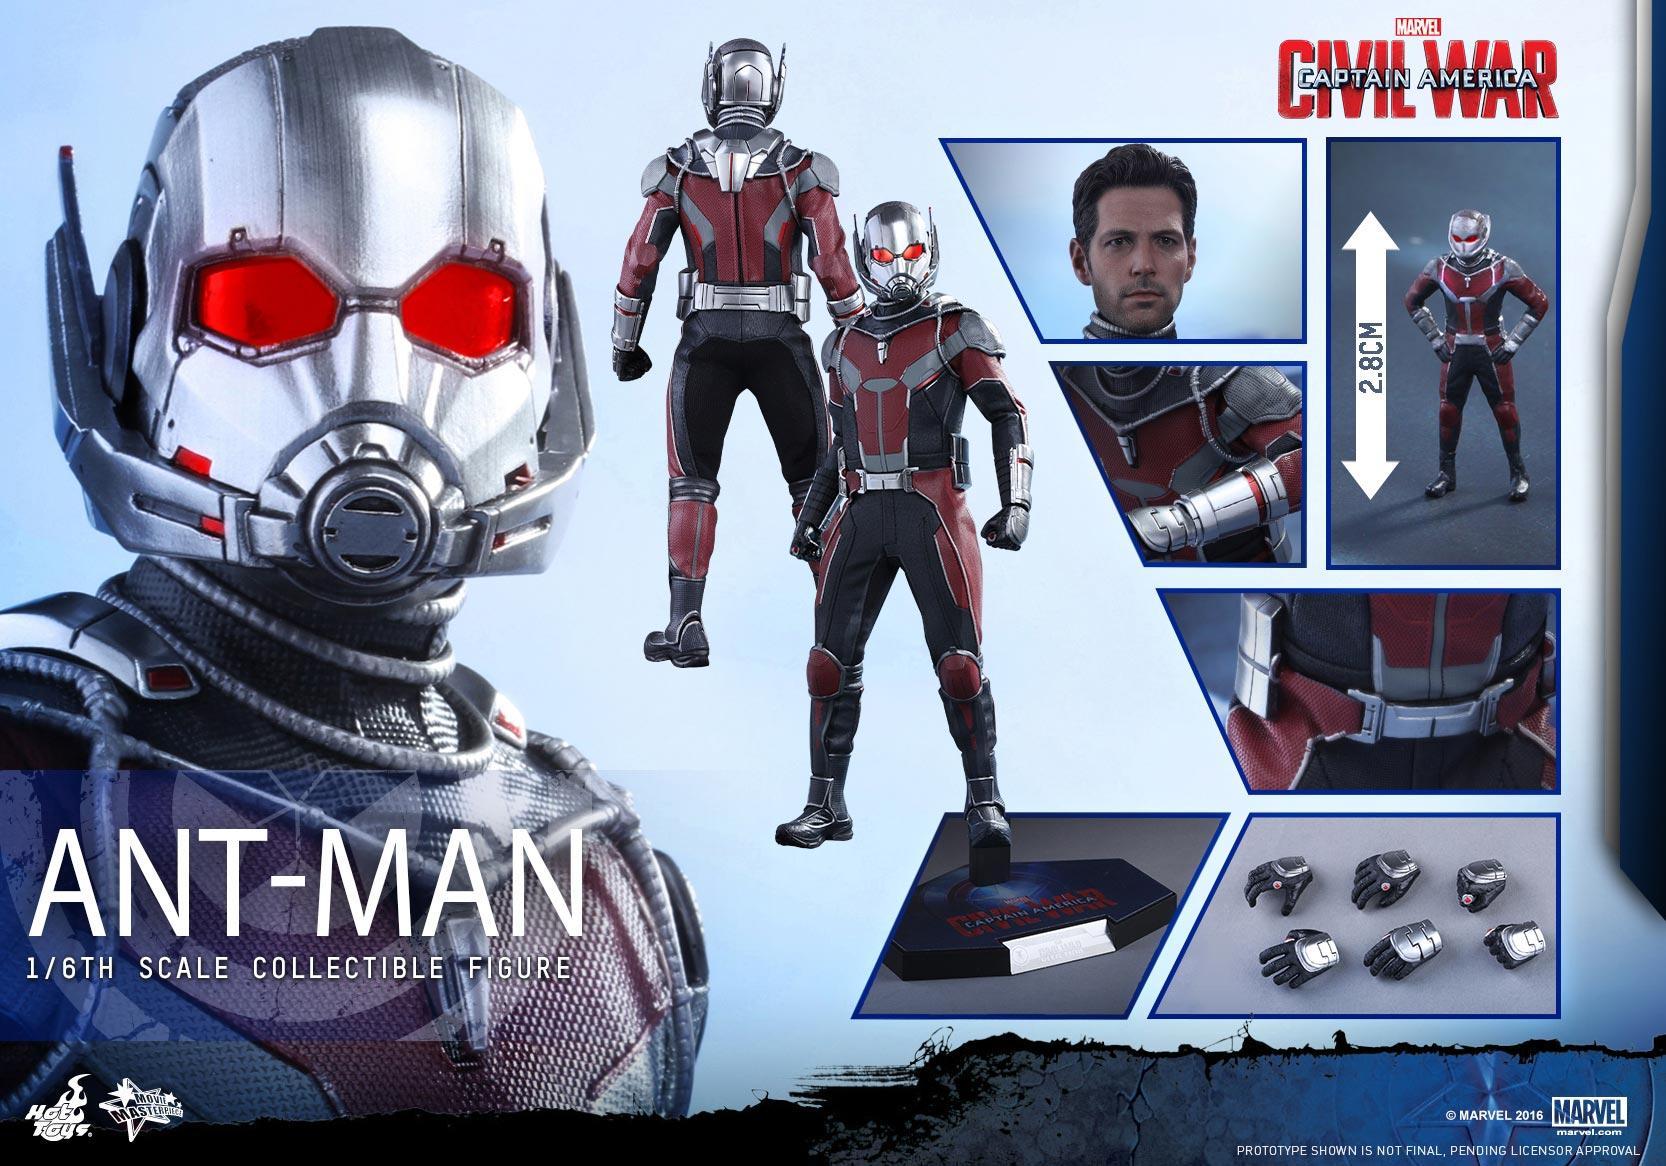 Hot-Toys---Captain-America-Civil-War---Ant-Man-Collectible-Figure-PR_20